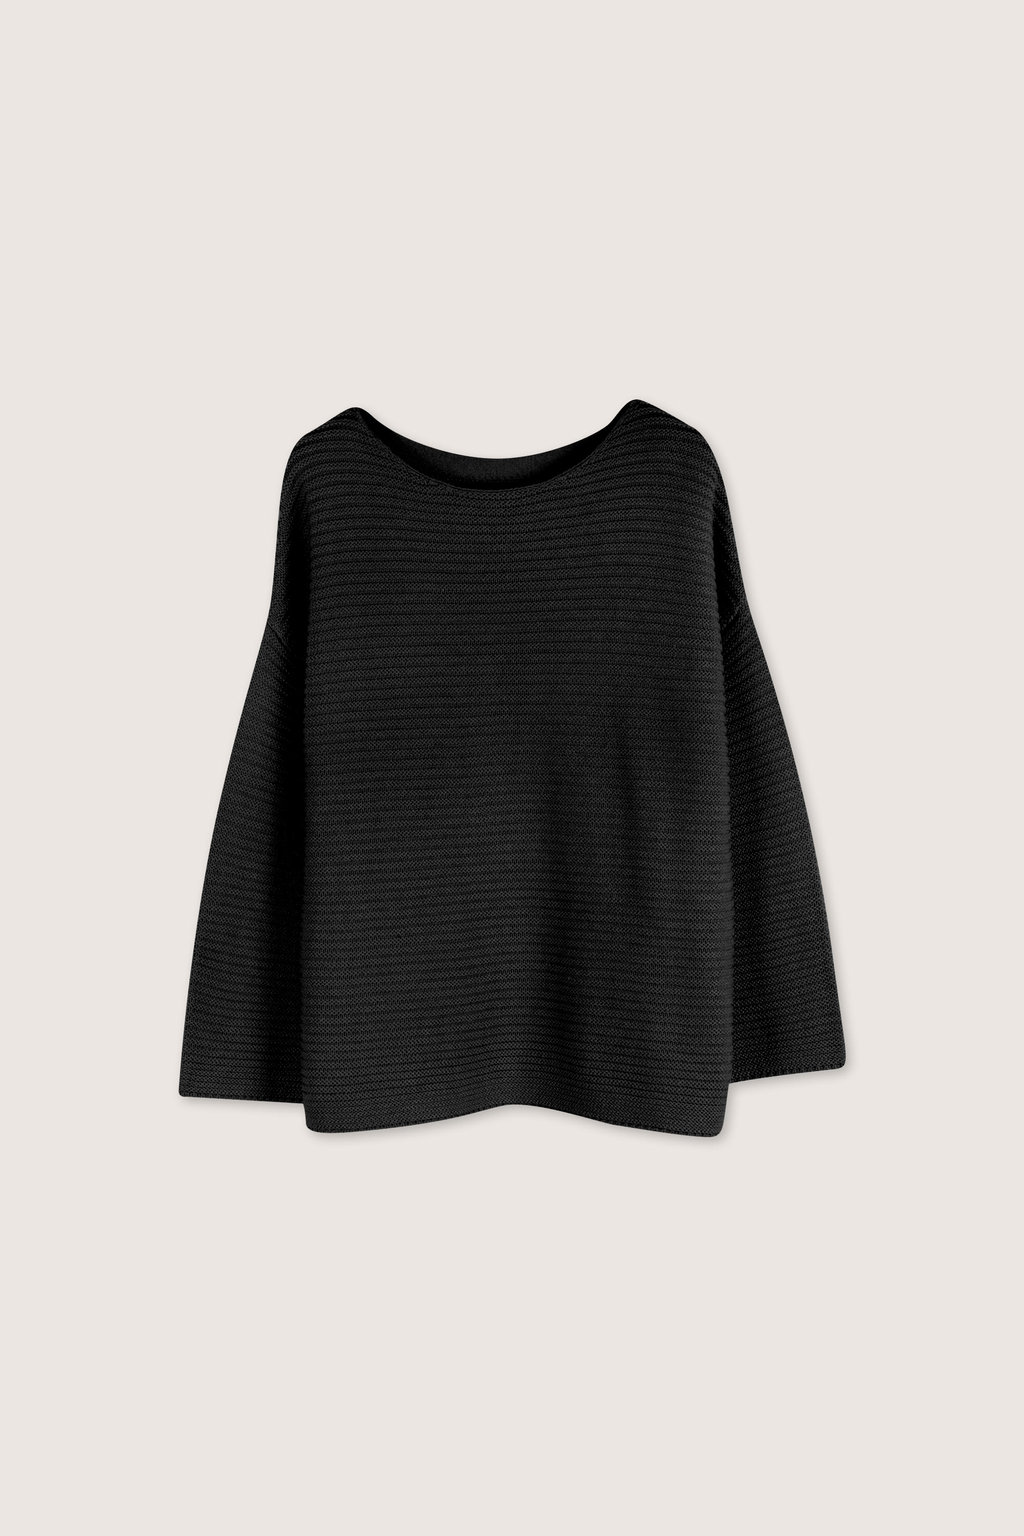 Sweater 1829 Black 7